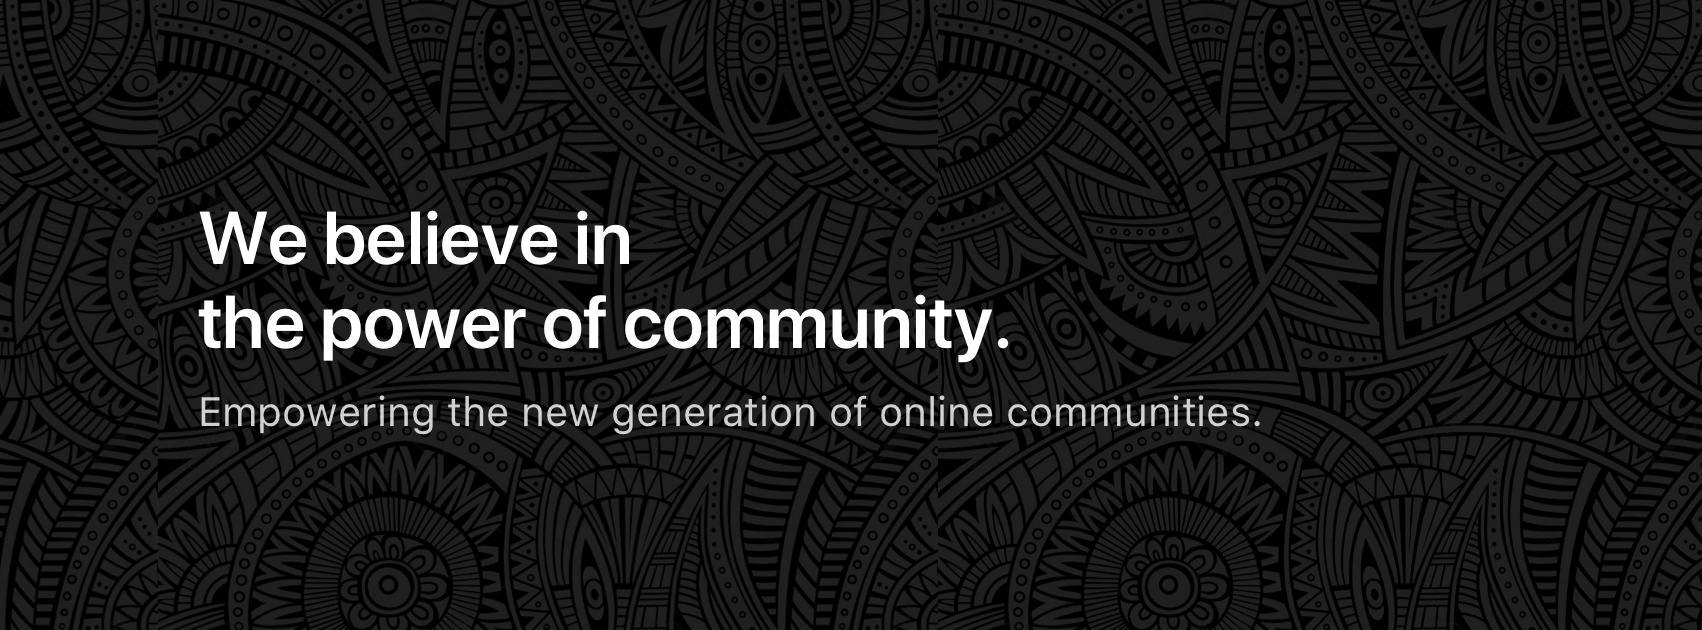 Review Tribe Community Platform: Customizable Community Platform to Create Online Communities - Appvizer